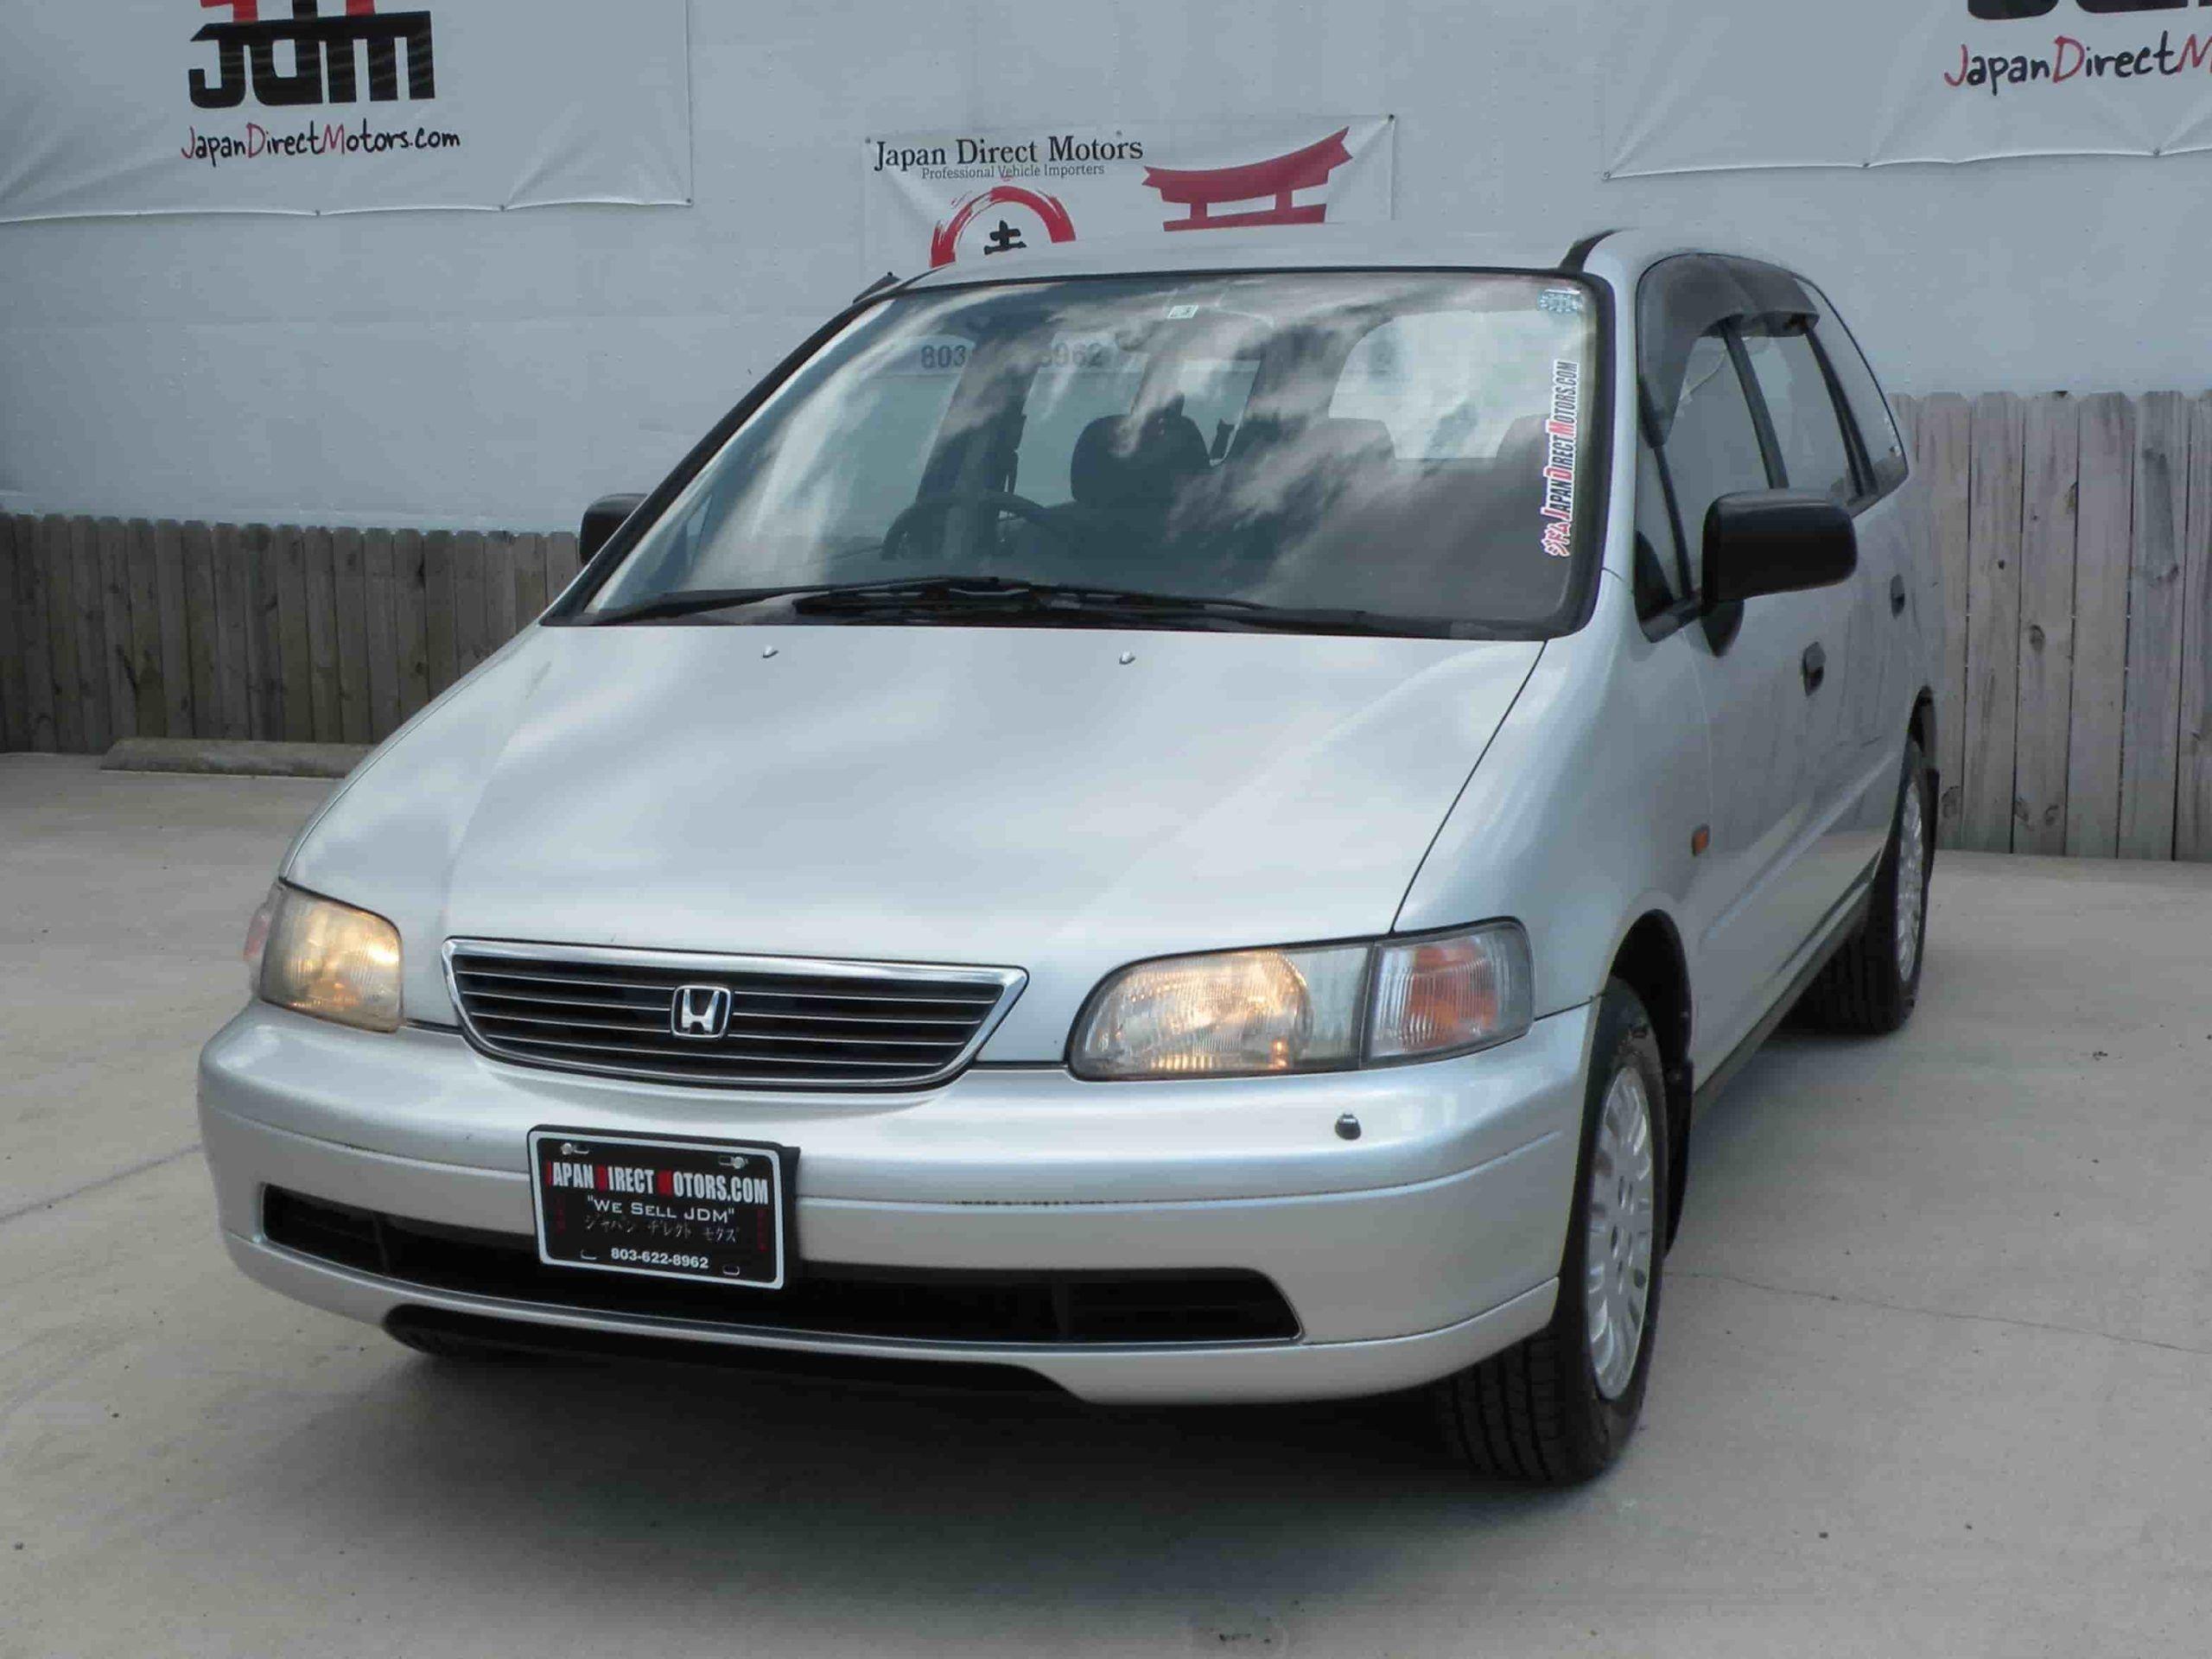 1995 Honda Odyssey L Van Jdmbuysell Com In 2020 Honda Odyssey Jdm Cars For Sale Honda